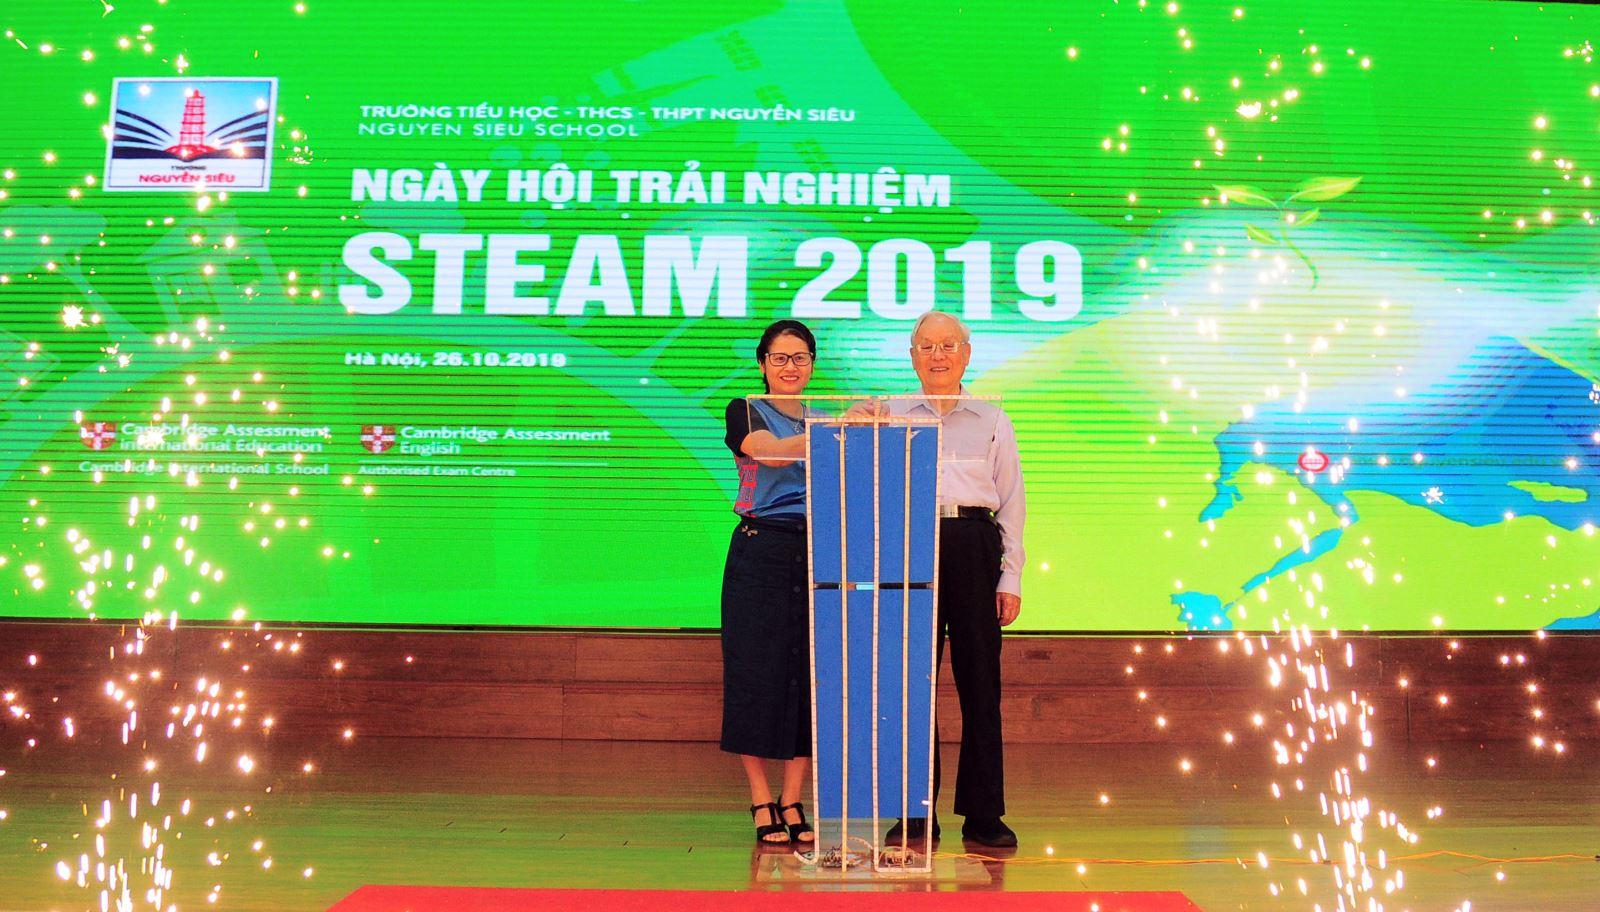 STEAM day at Nguyen Sieu